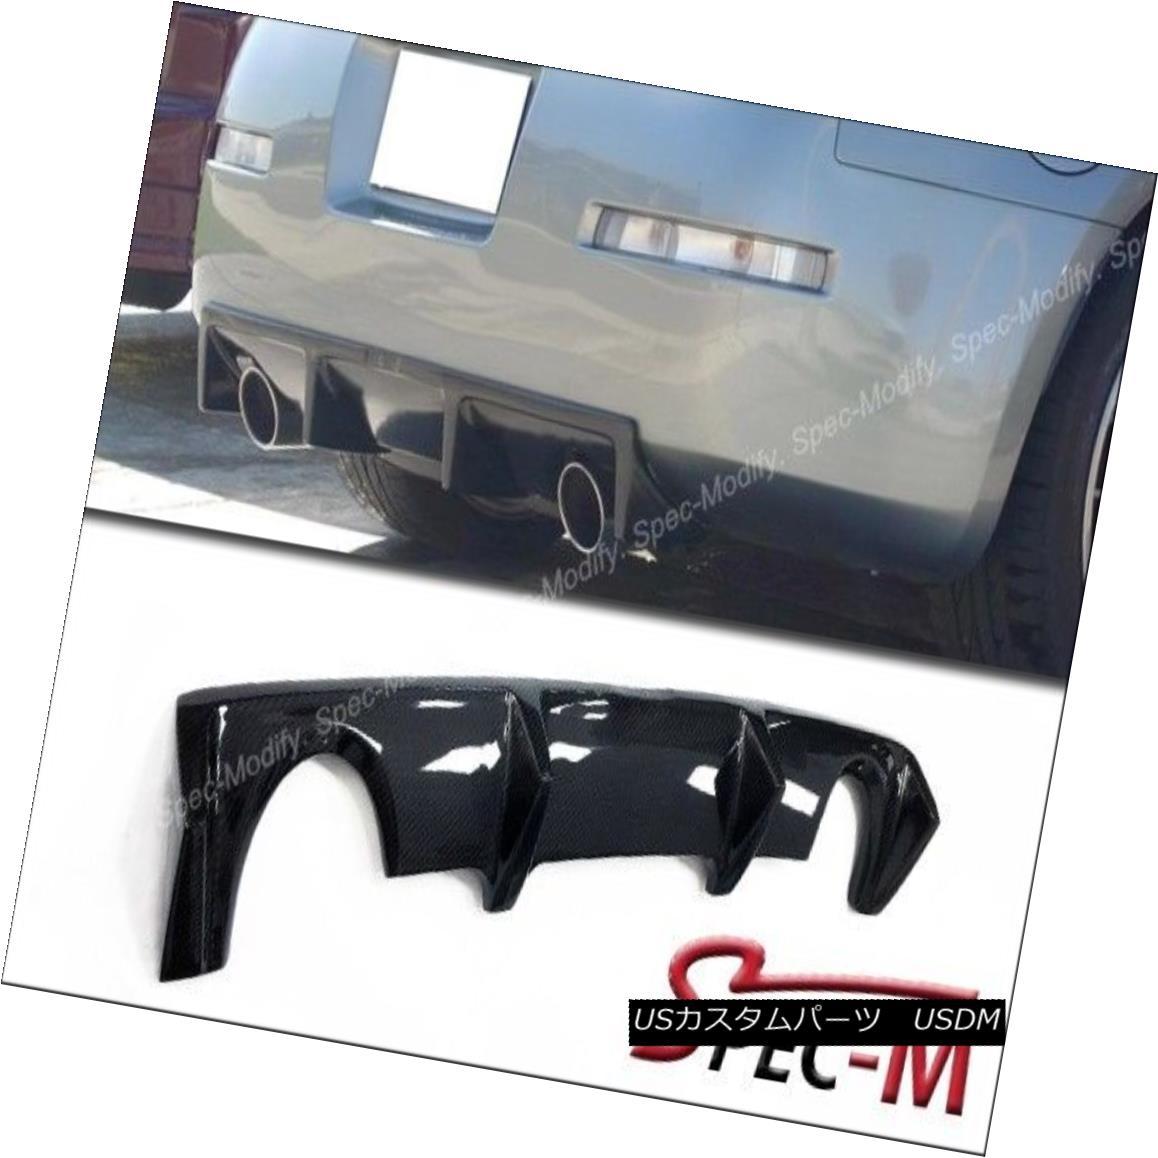 Carbon Fairlady DPカーボンファイバーリアバンパーディフューザーフィット日産350Z Diffuser Z33フェアレディZ Add Z33 Fiber エアロパーツ Rear On DP Bumper Fit 350Z Nissan Z